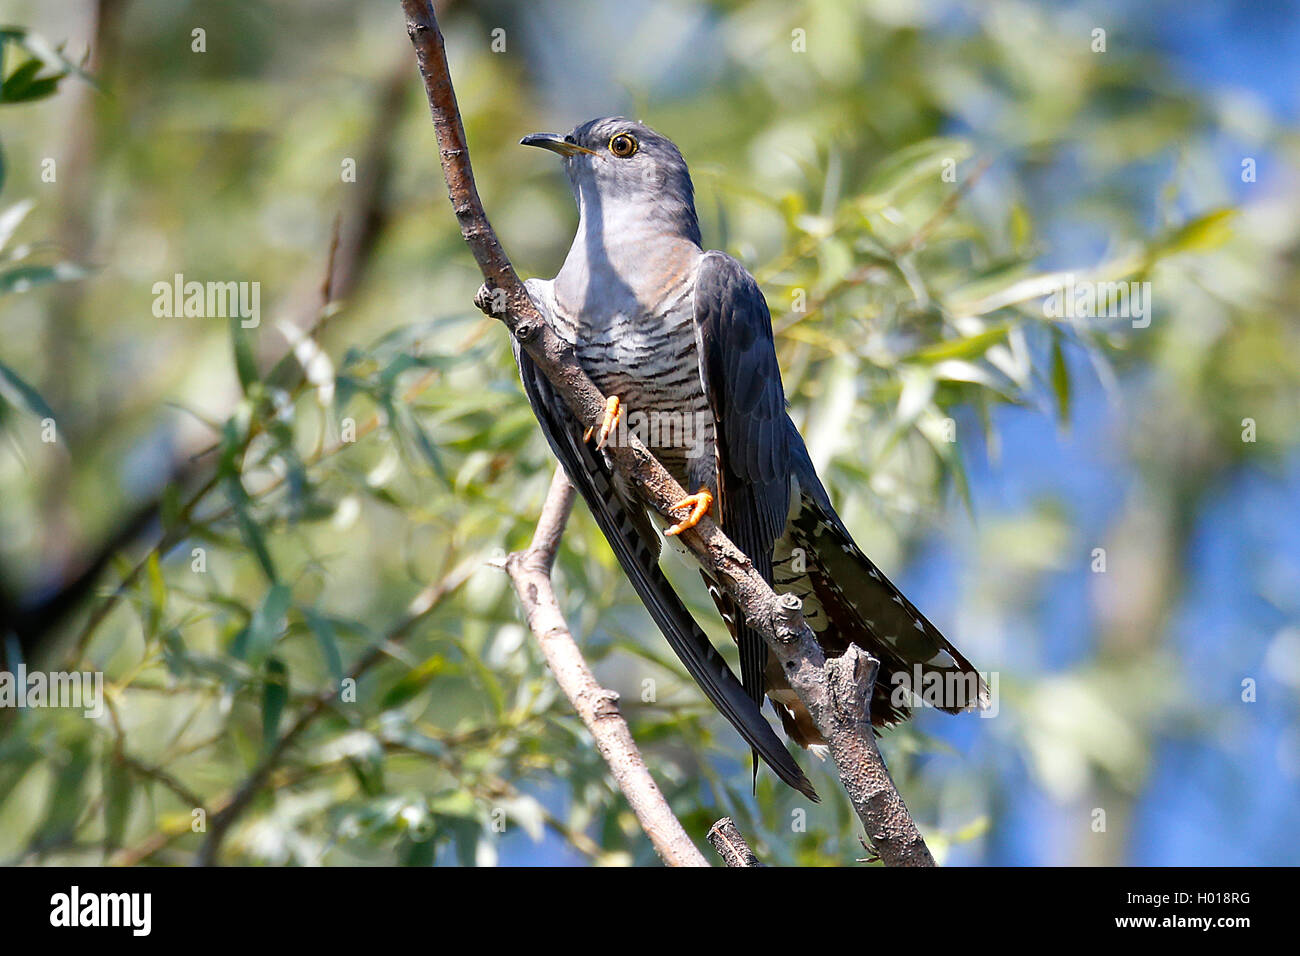 Kuckuck (Cuculus canorus), sitzt auf einem Ast, Rumaenien, Donaudelta | Eurasian cuckoo (Cuculus canorus), sitting - Stock Image